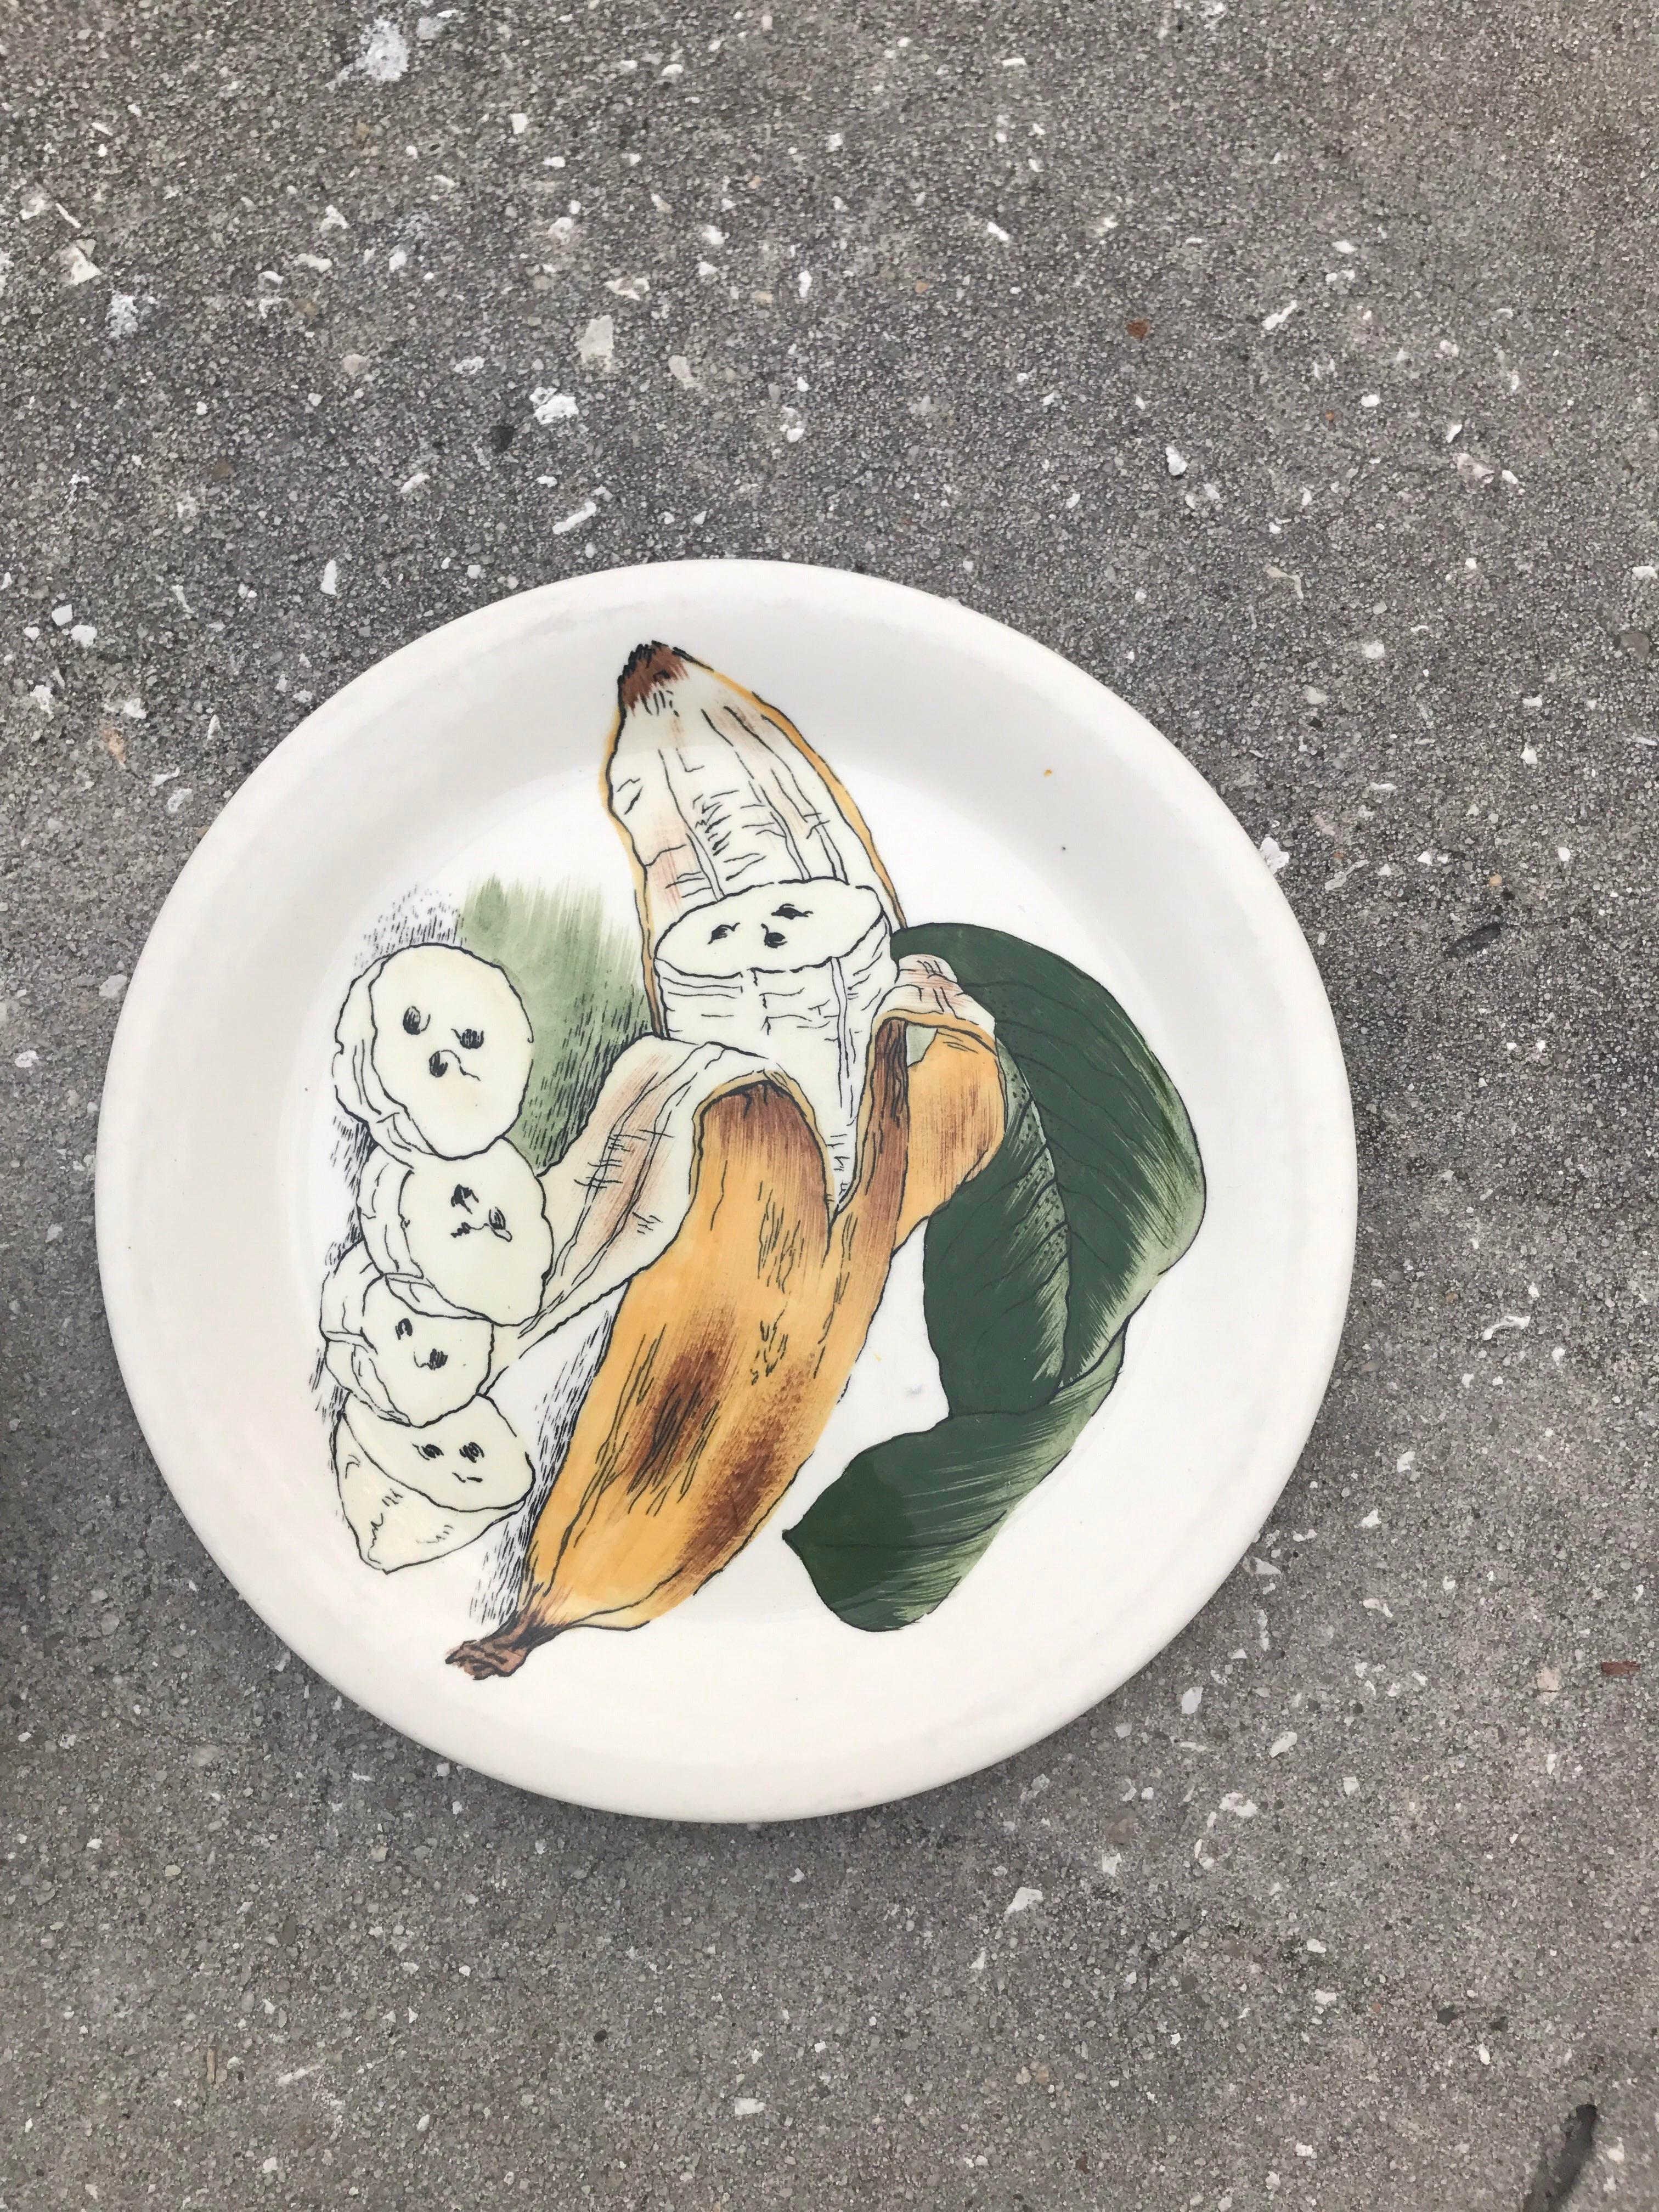 Staffordshire Banana u0026 Orange Decorative Plates - A Pair - Image 2 ...  sc 1 st  Chairish & Staffordshire Banana u0026 Orange Decorative Plates - A Pair | Chairish